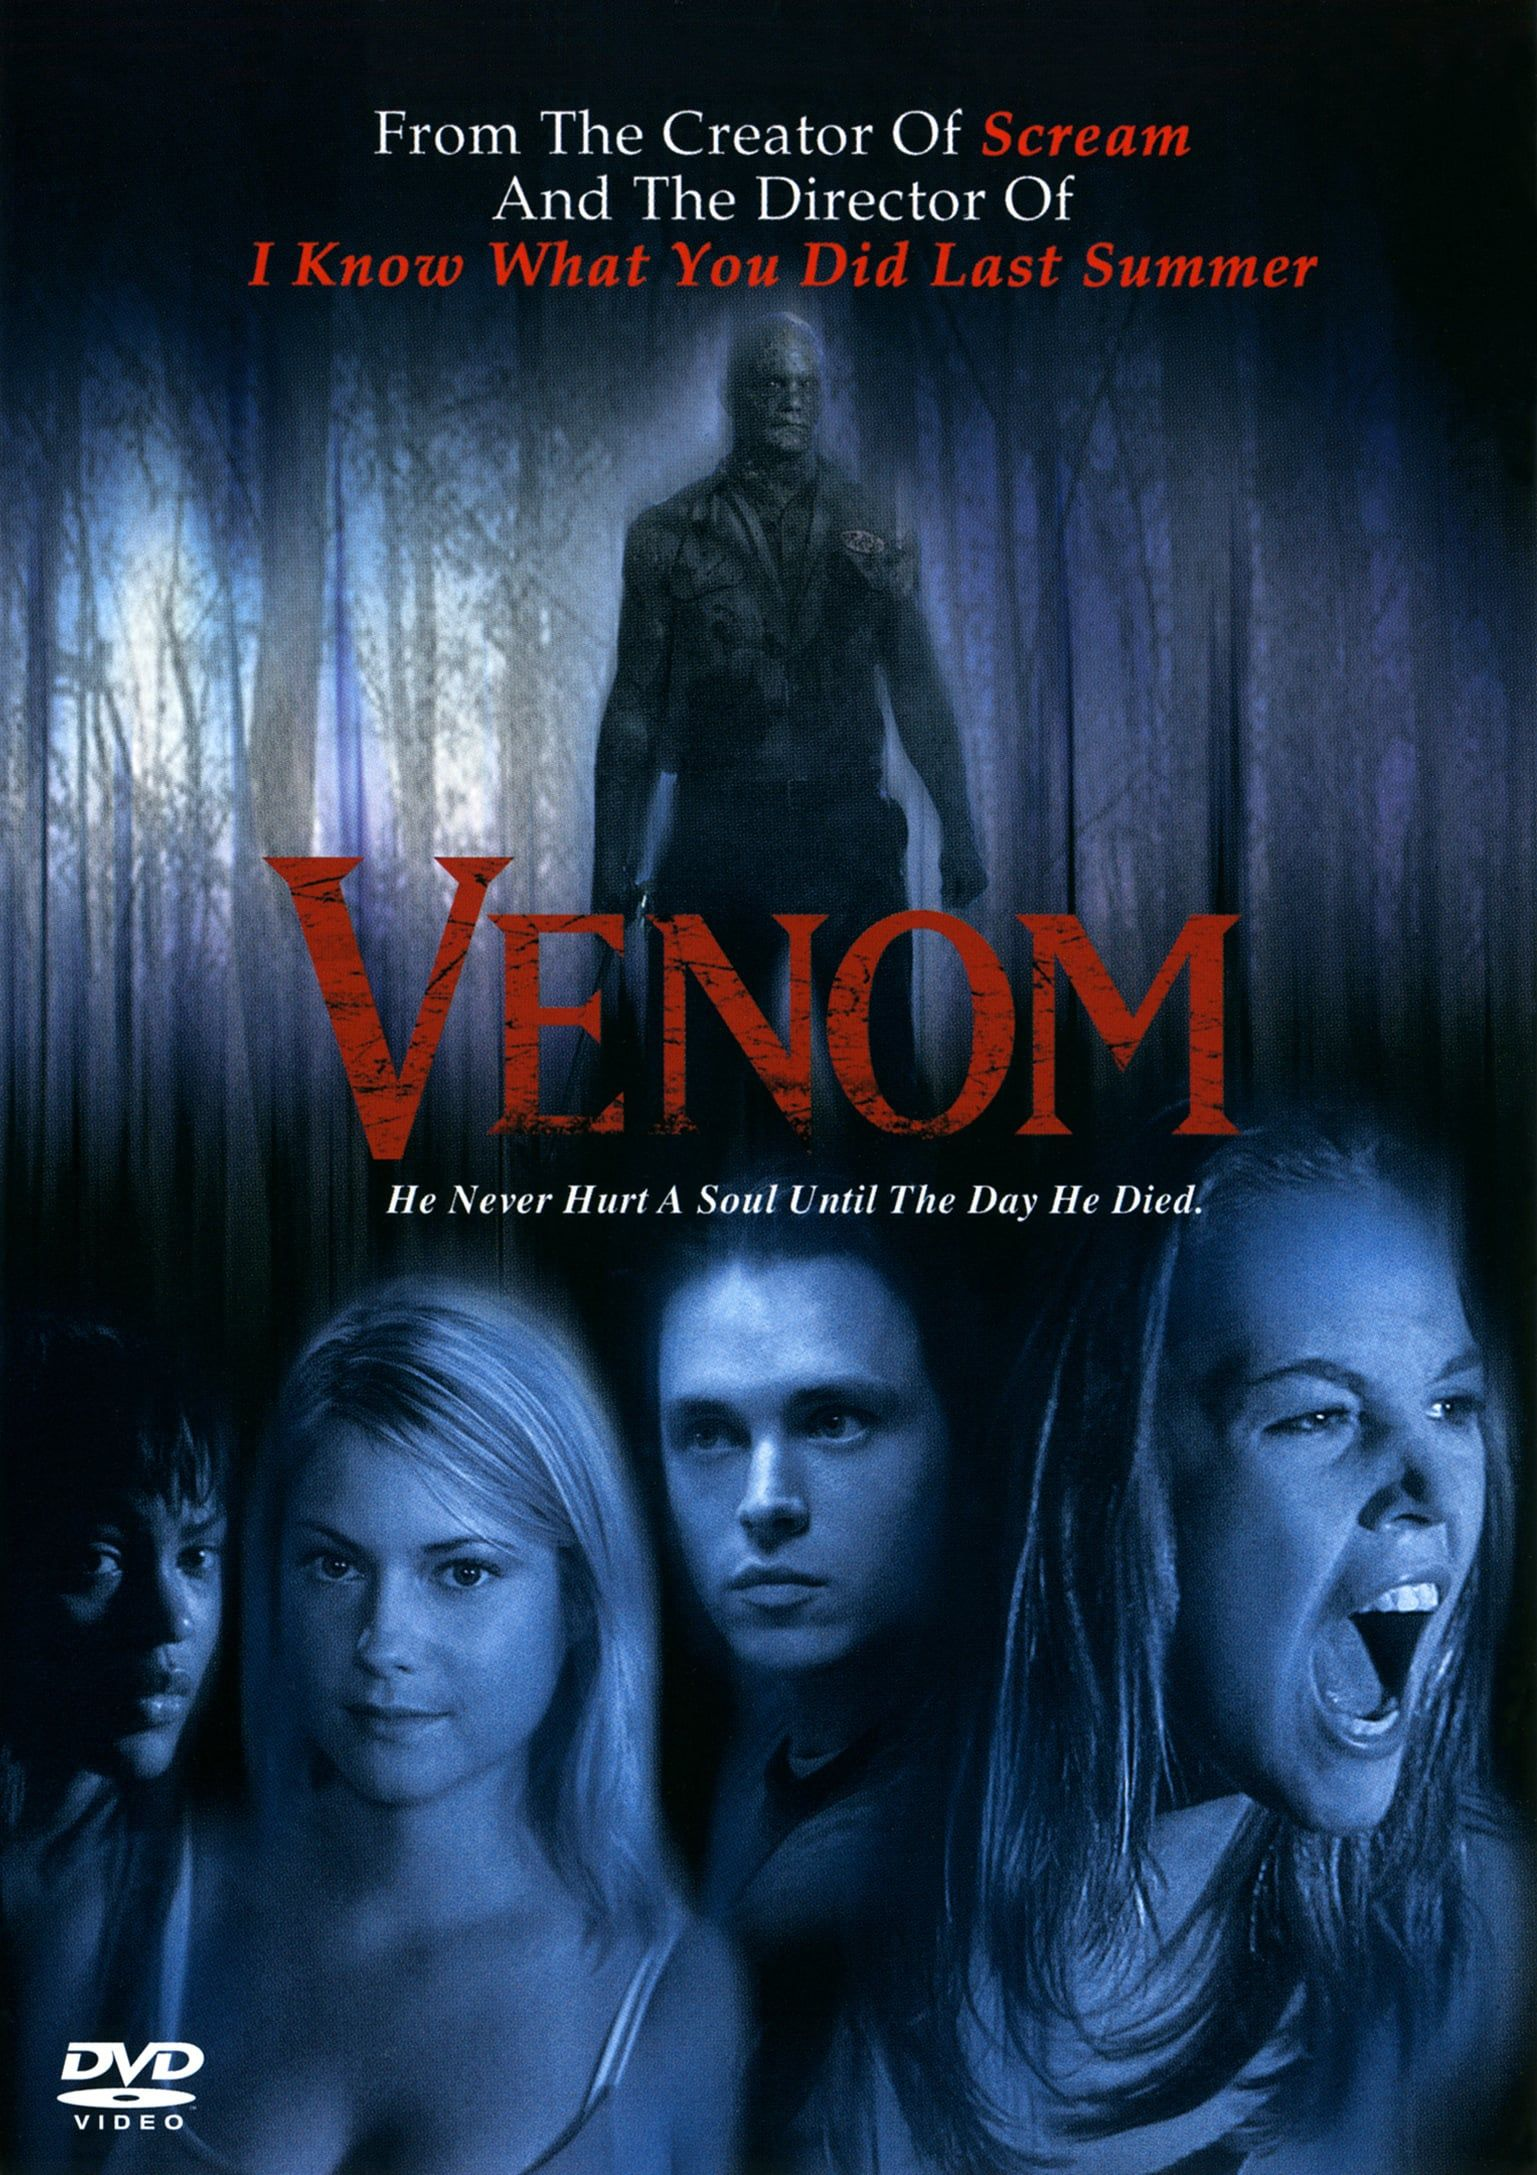 Venom full movie Streaming Online In Hd 720p Video